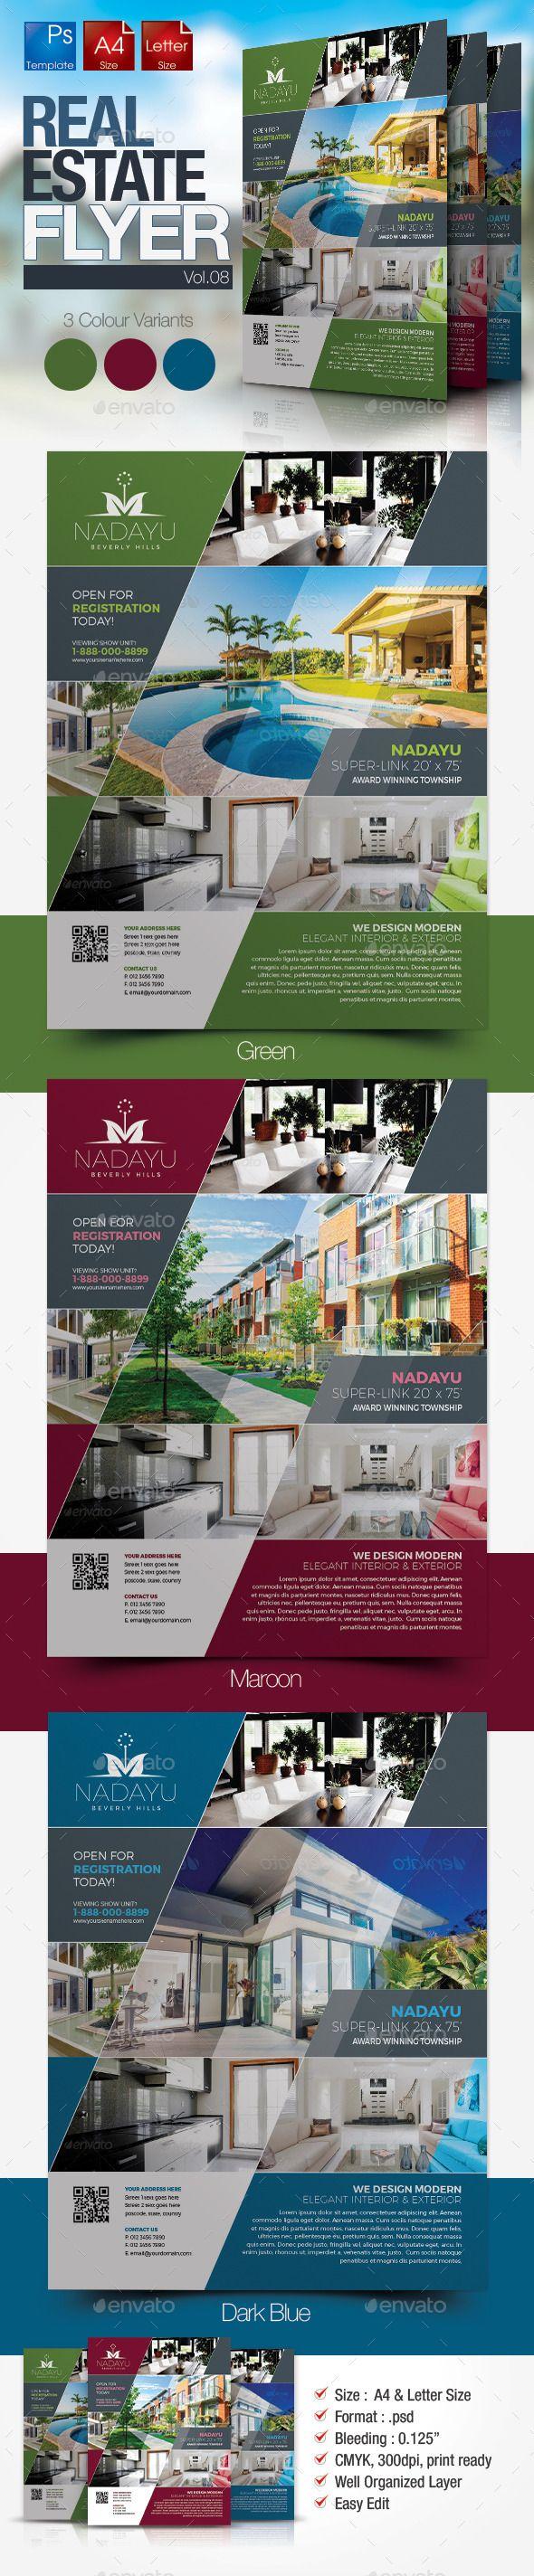 Simple Real Estate Flyer Vol Pinterest Real Estate Flyers - Photoshop real estate flyer templates